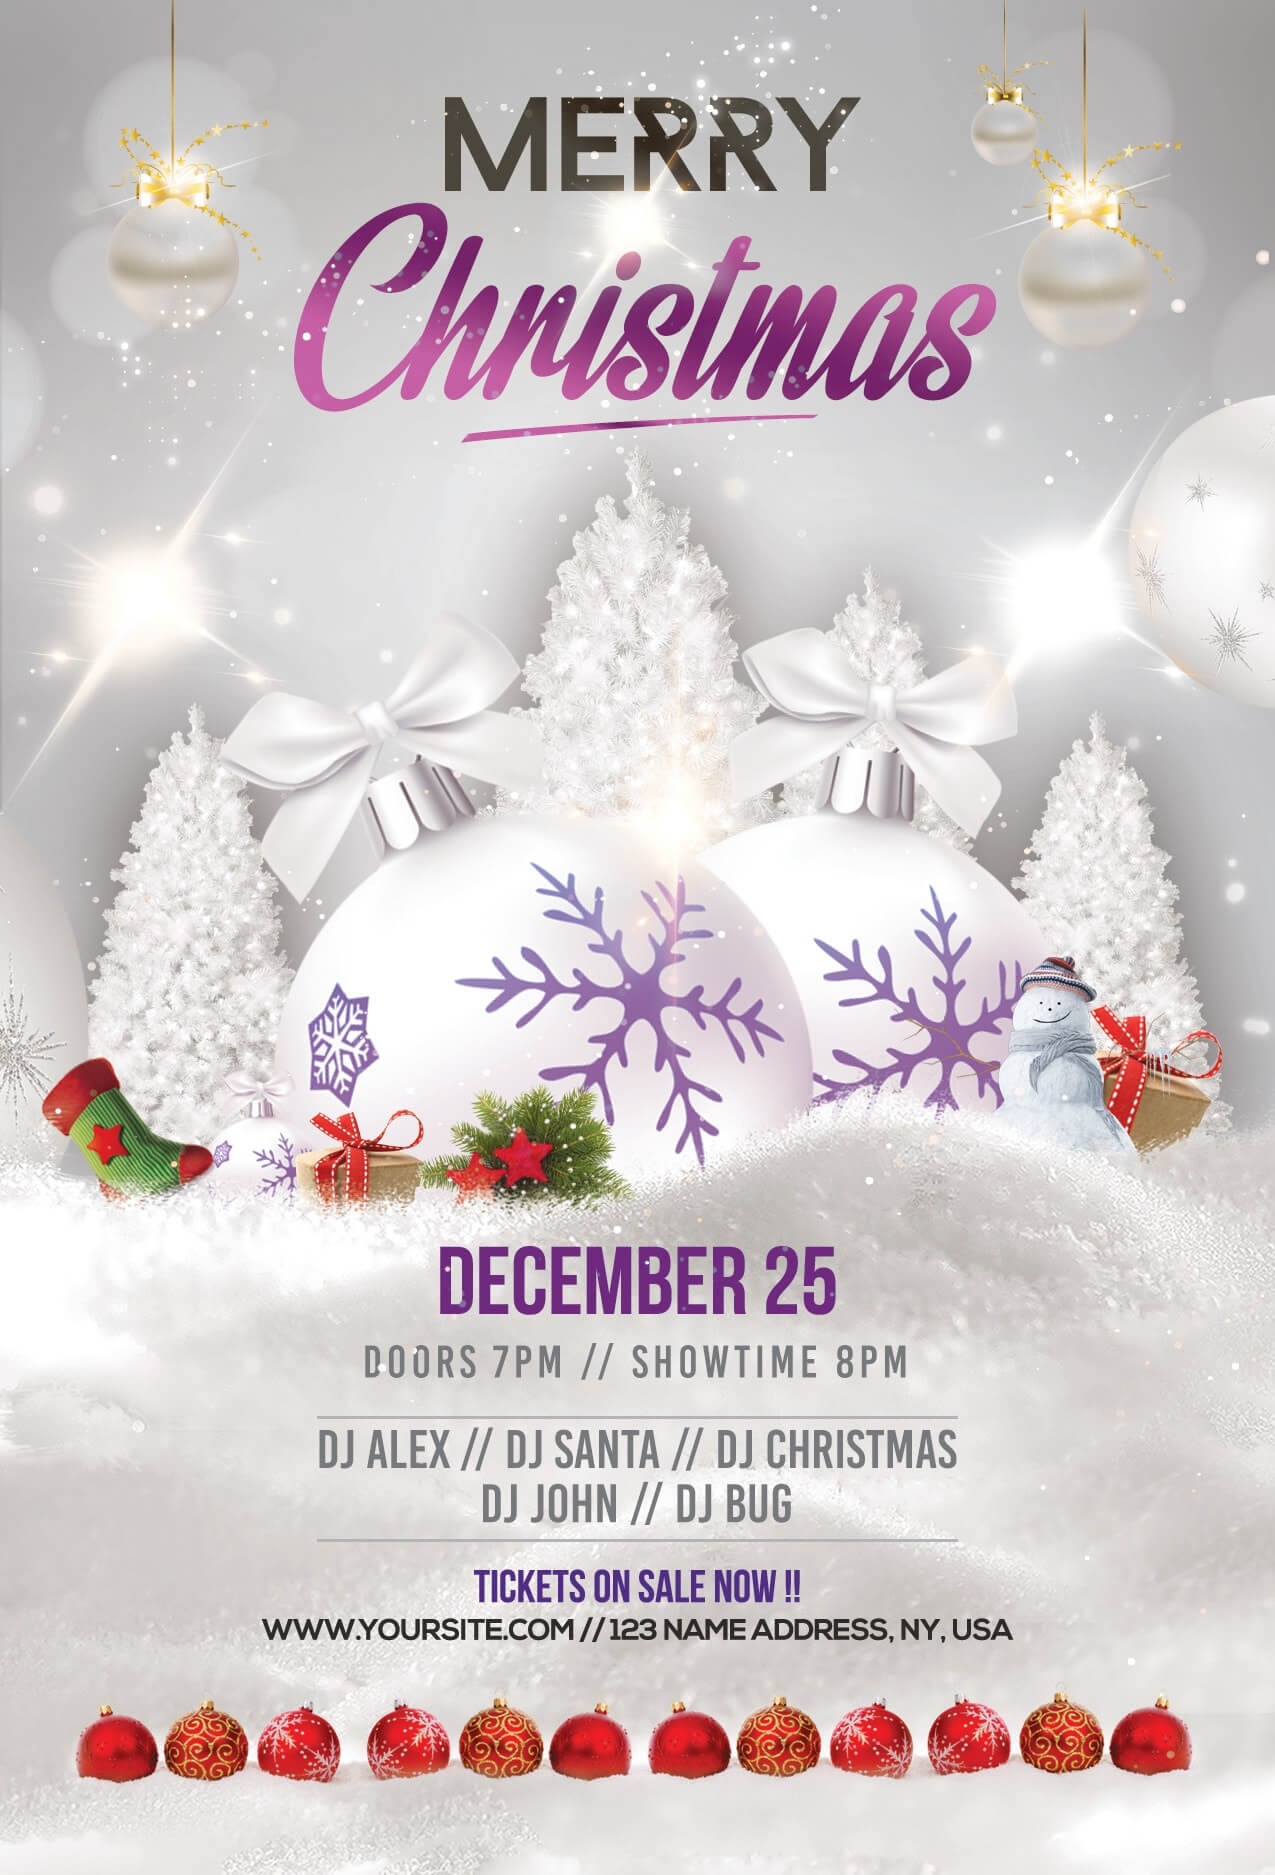 Merry Christmas & Holiday Free Psd Flyer Template - Stockpsd Inside Christmas Brochure Templates Free